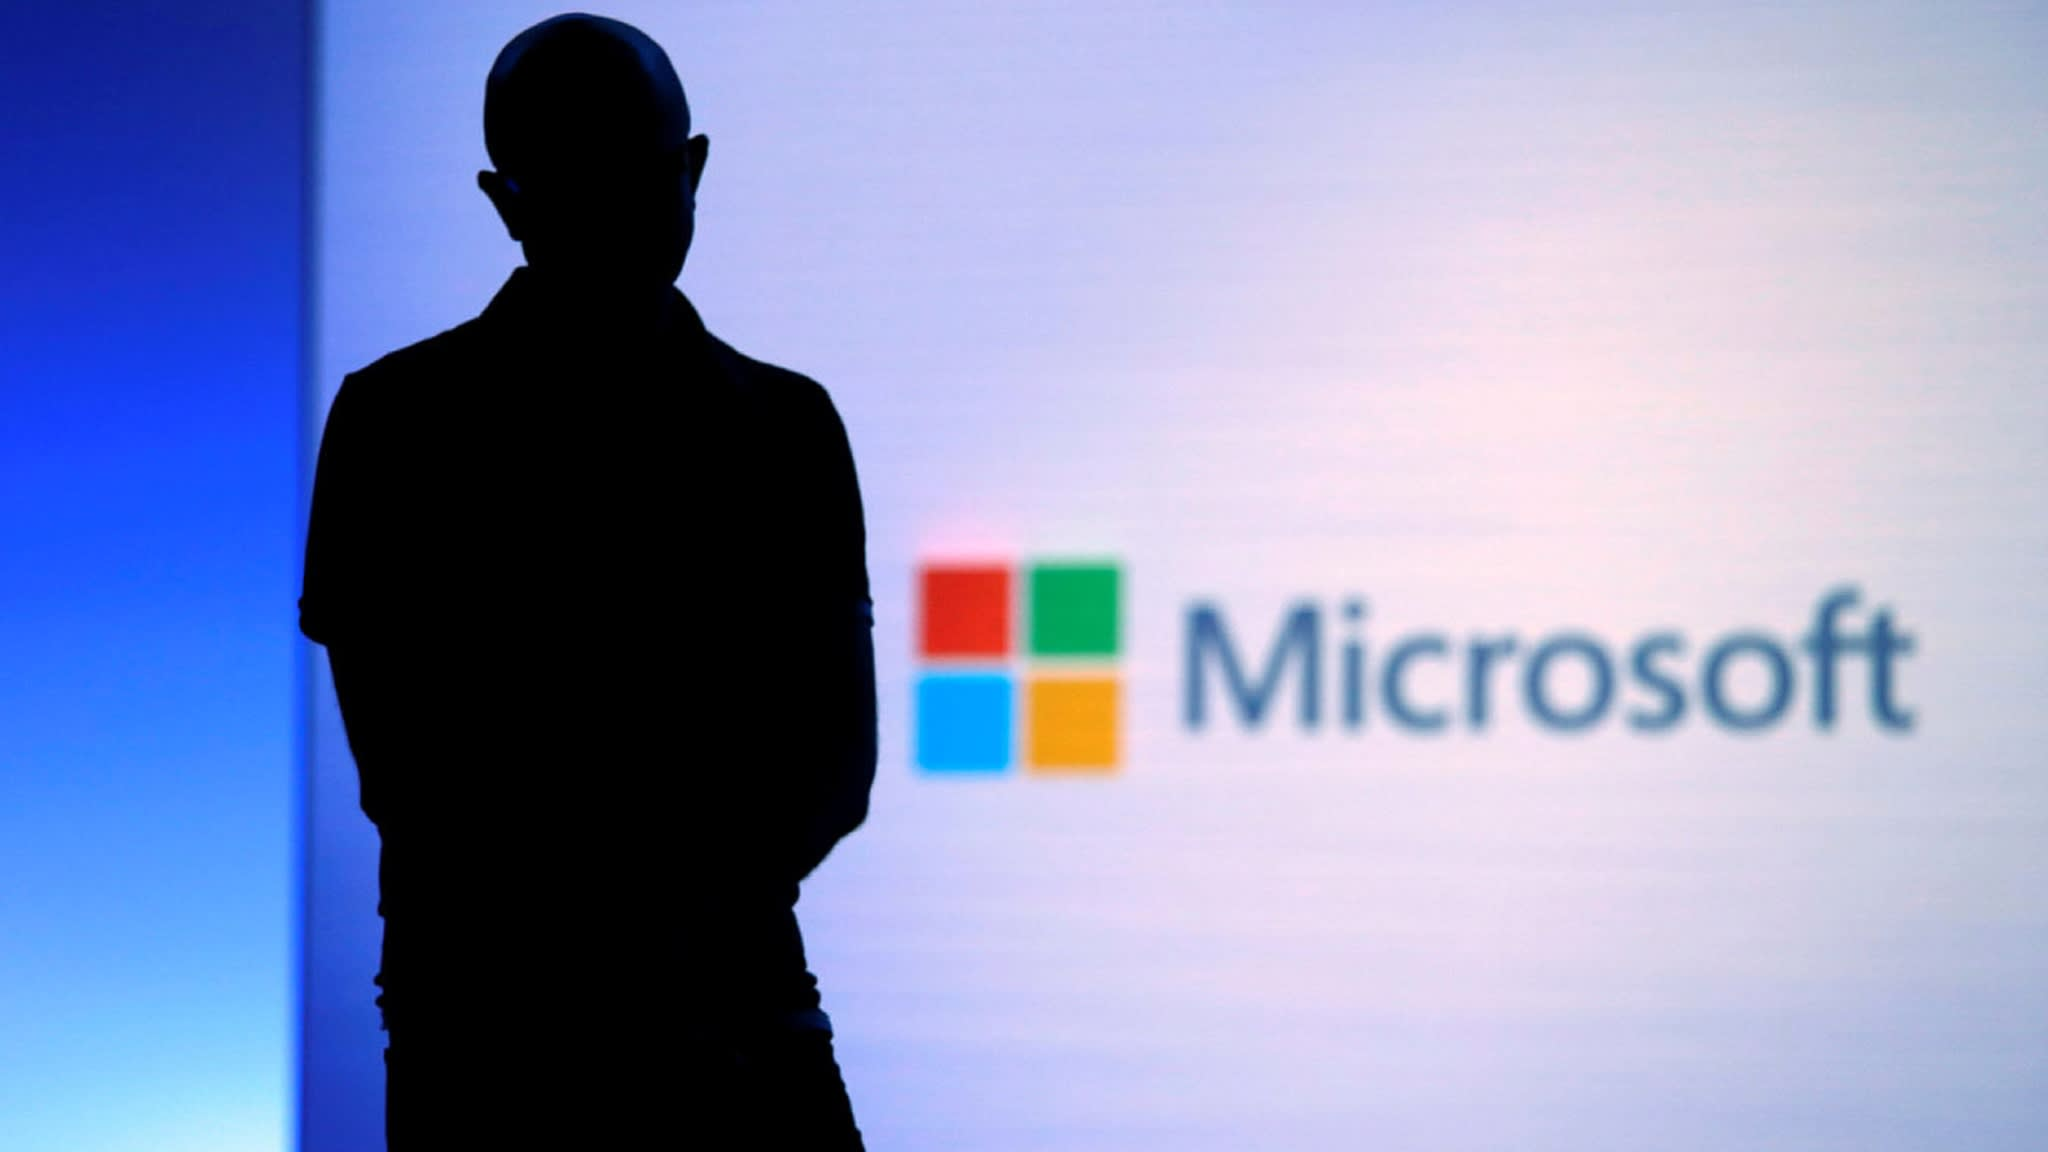 Microsoft's cloud unit drives upbeat quarterly results